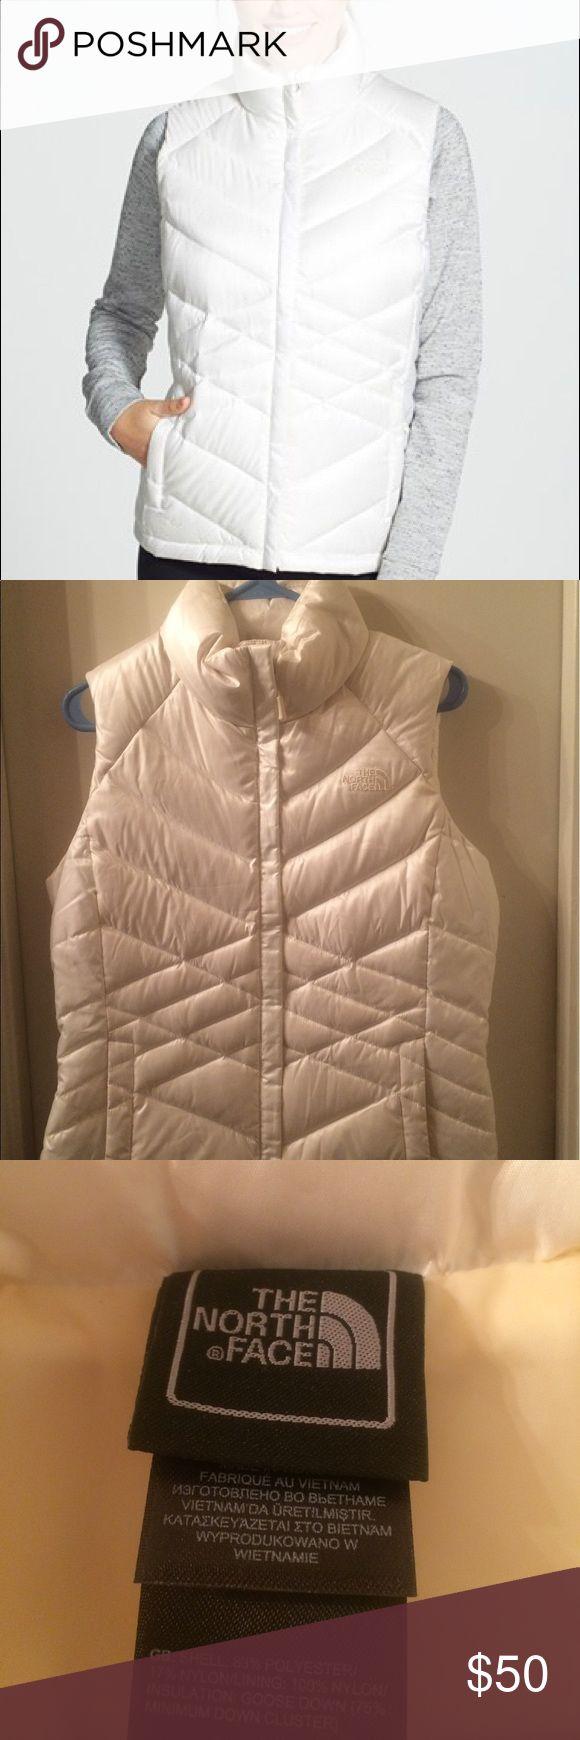 The North Face Women's Aconcagua Vest Hardly worn North Face Vest! Like new!! North Face Jackets & Coats Vests